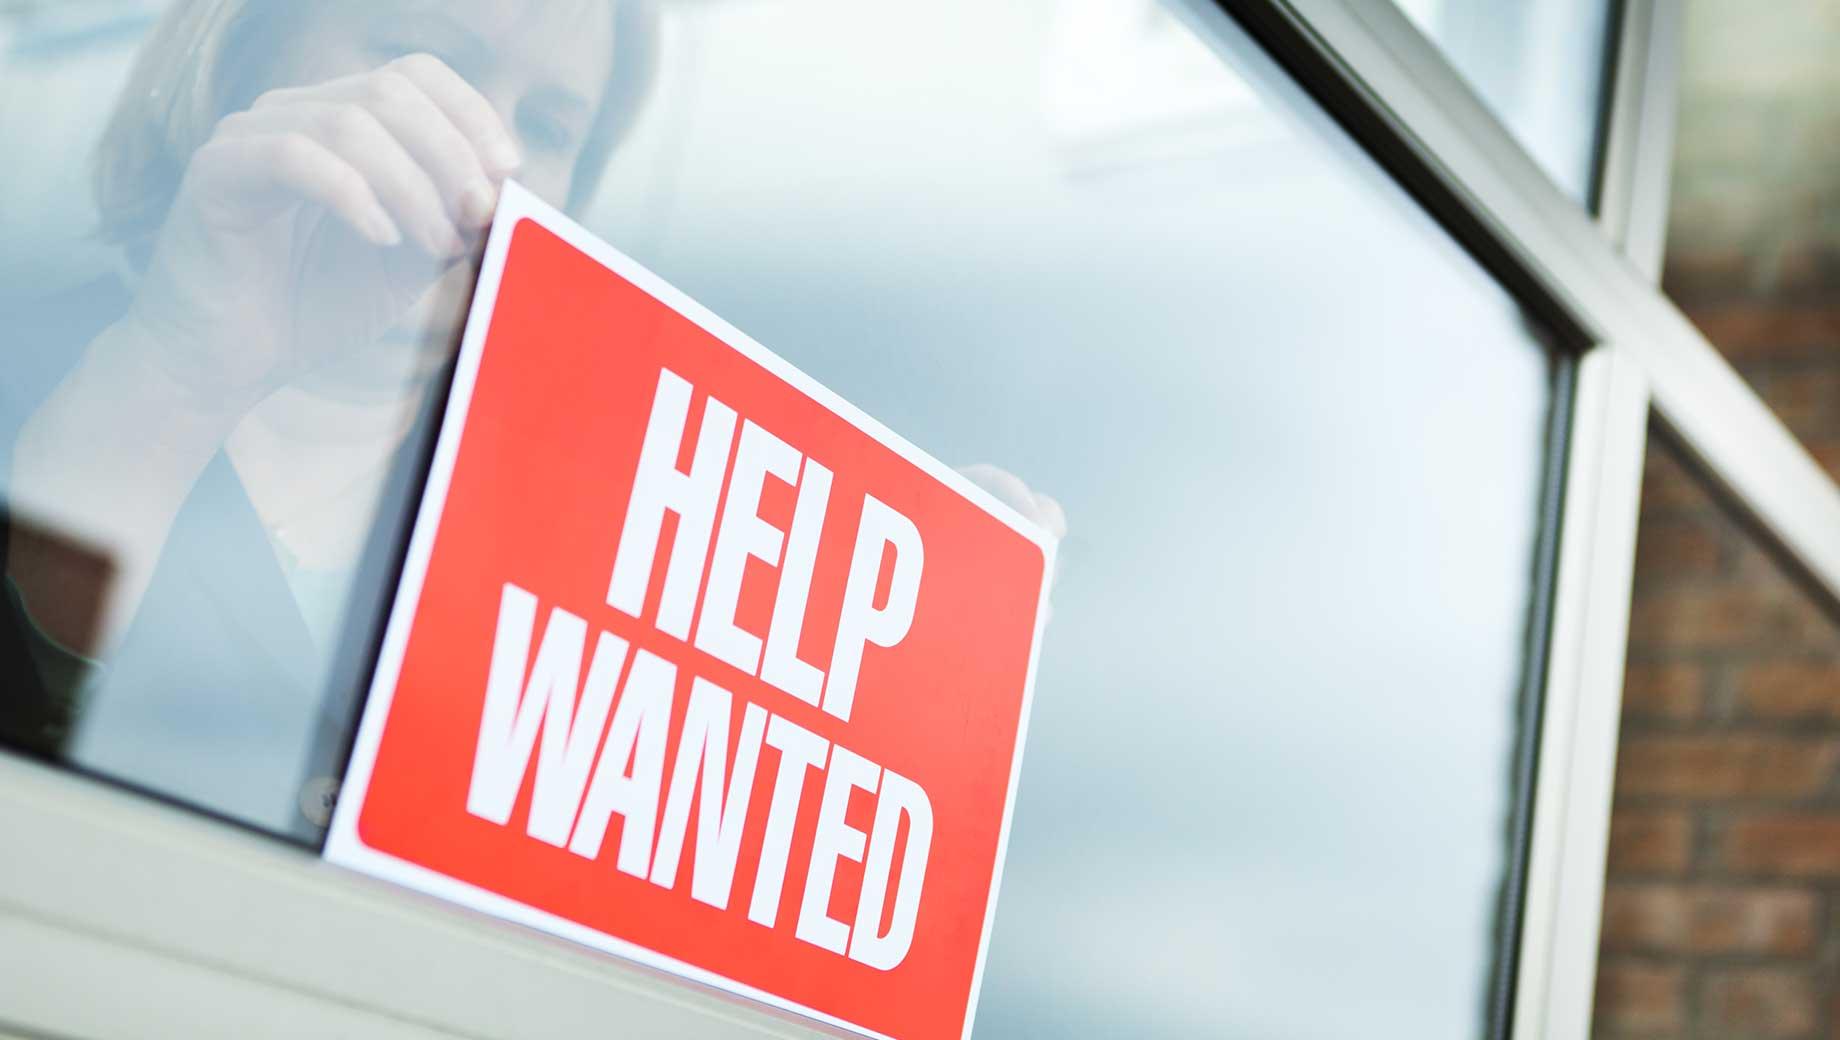 GALLUP – U.S. Job Market Evaluations Improved, Still Lag Pre-Pandemic